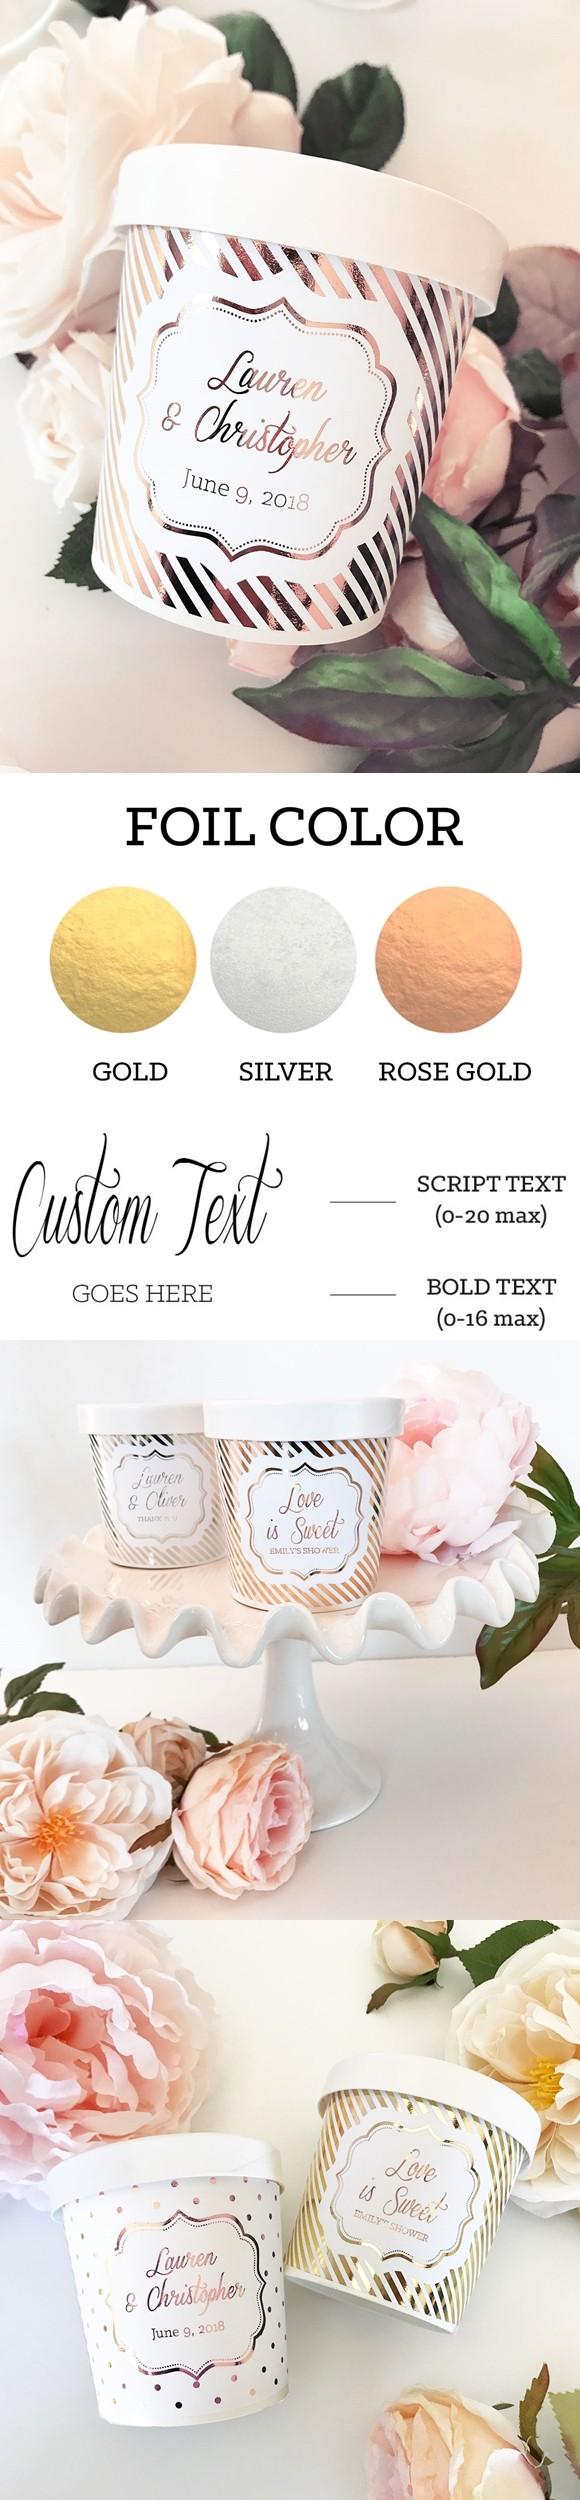 Personalized Metallic Foil Custom Mini Ice Cream Containers (3 Colors)